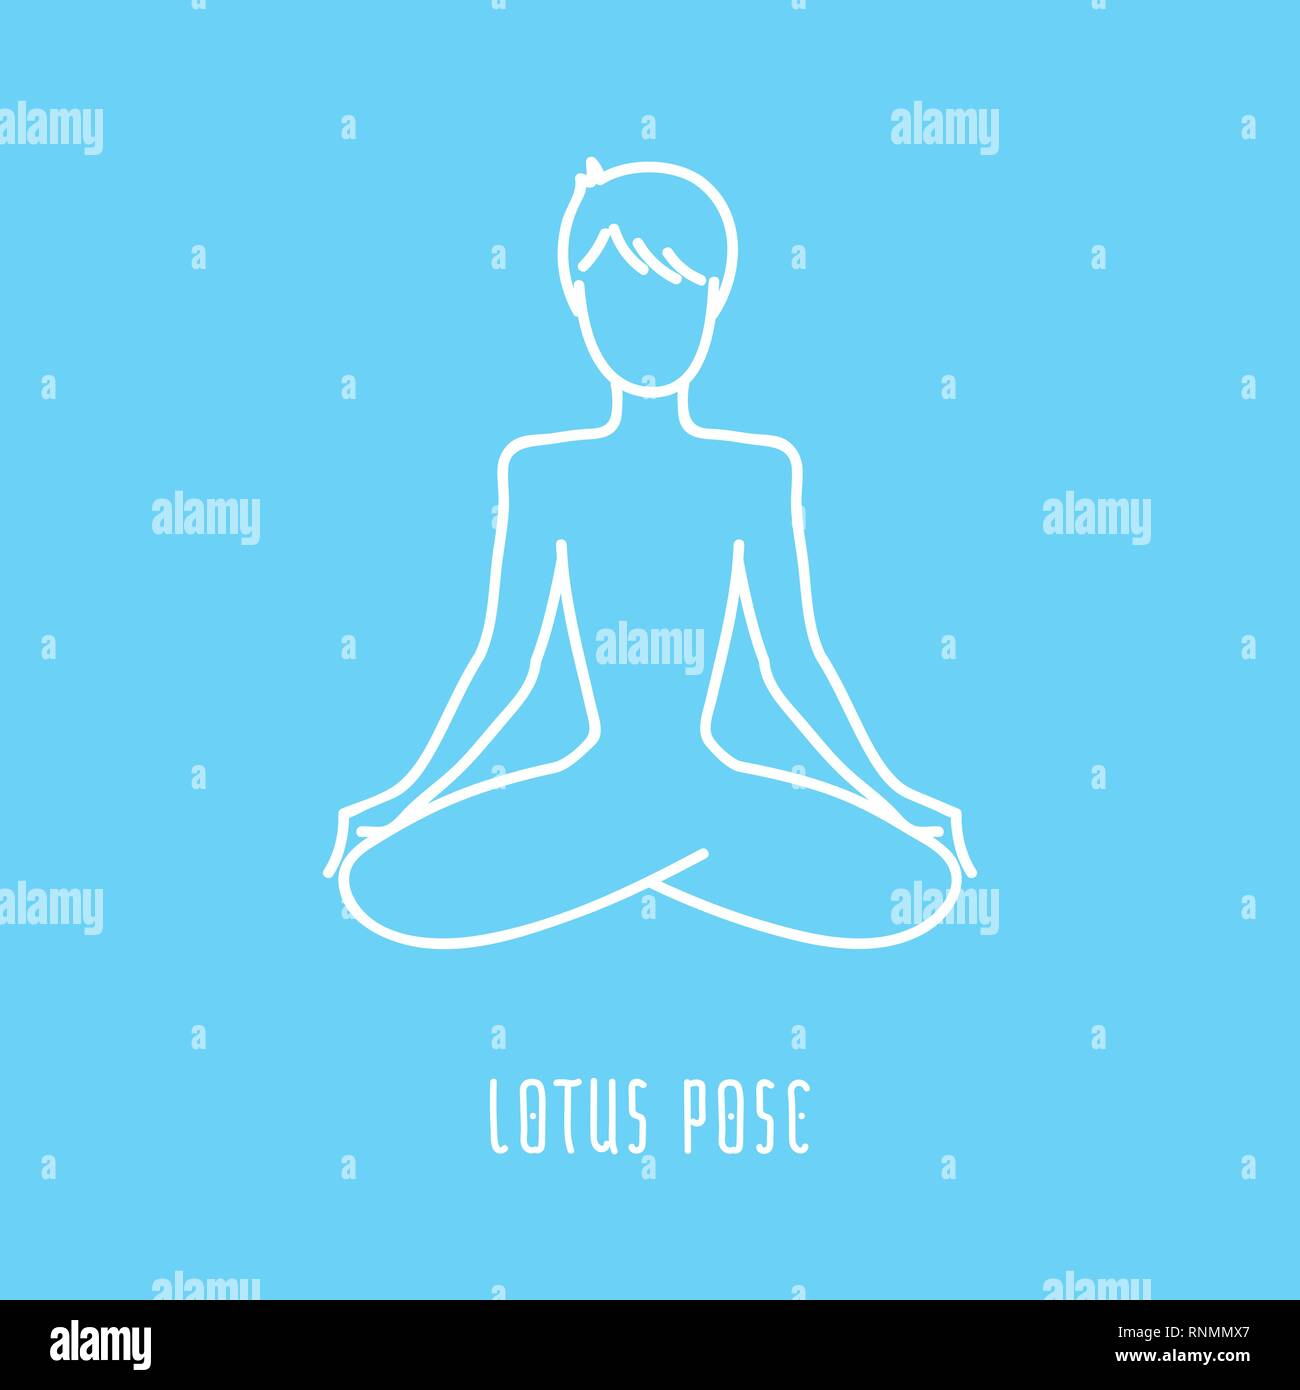 Yoga pose flat line icon, simple sign of man in easy pose, white outline logo isolated on baby blue - vector asana for sahasrara chakra, design elemen - Stock Image